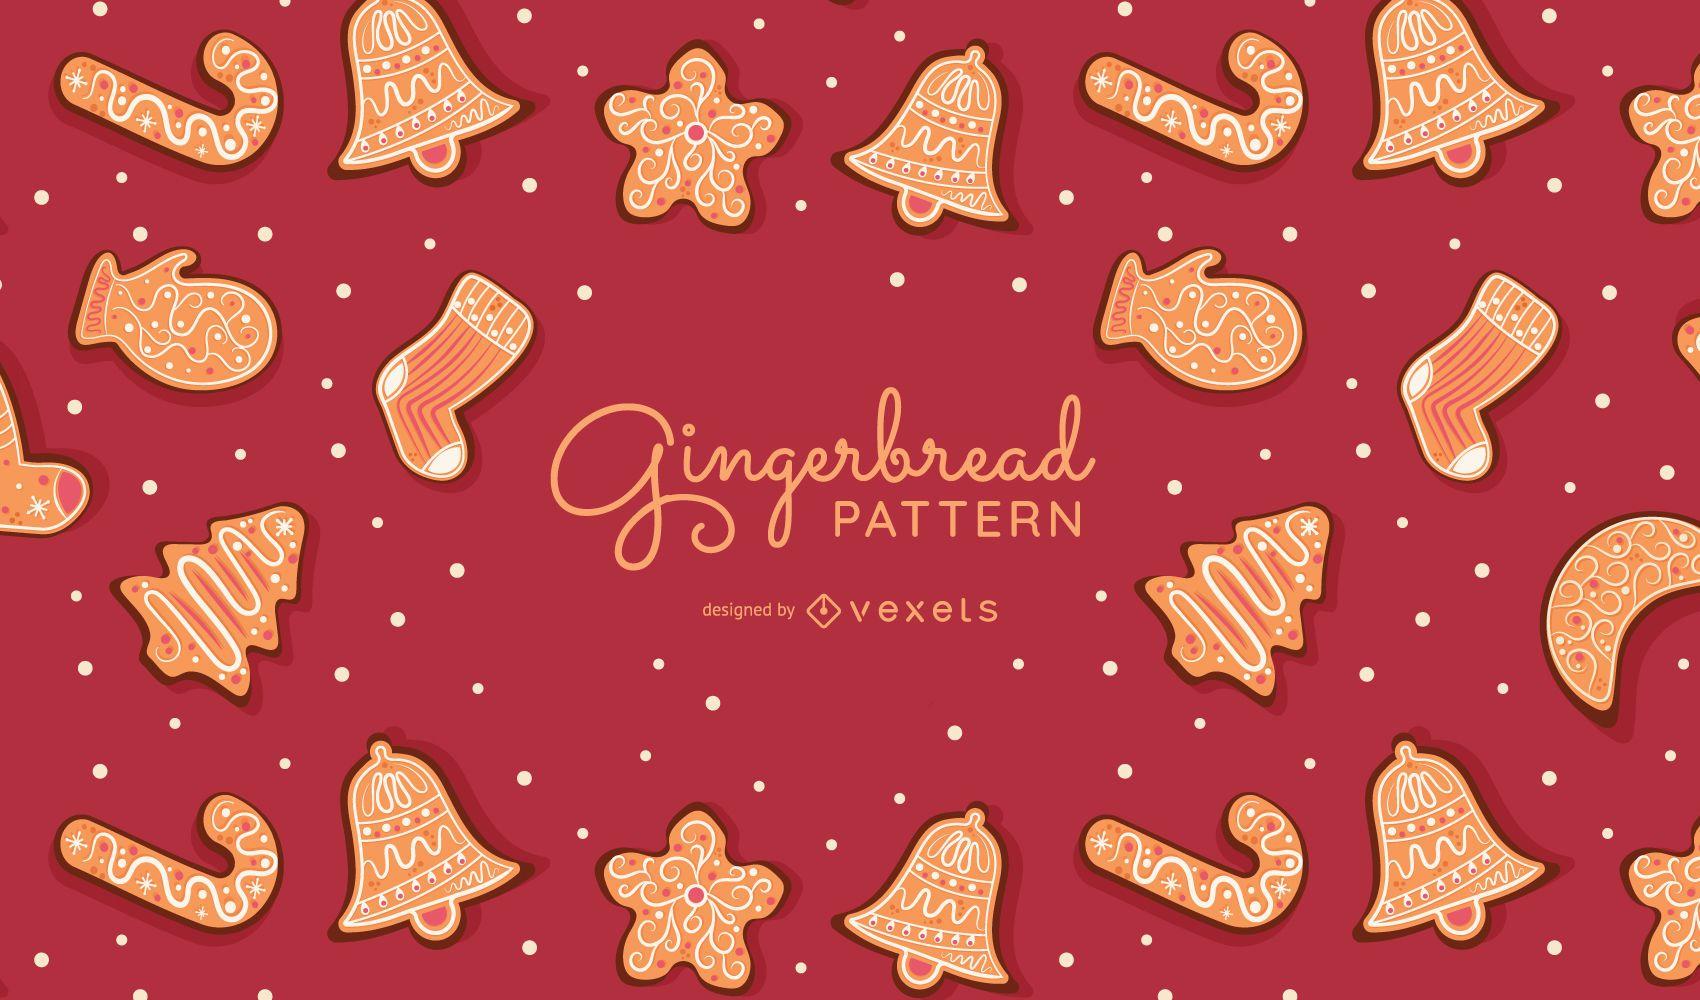 Gingerbread cookies pattern design